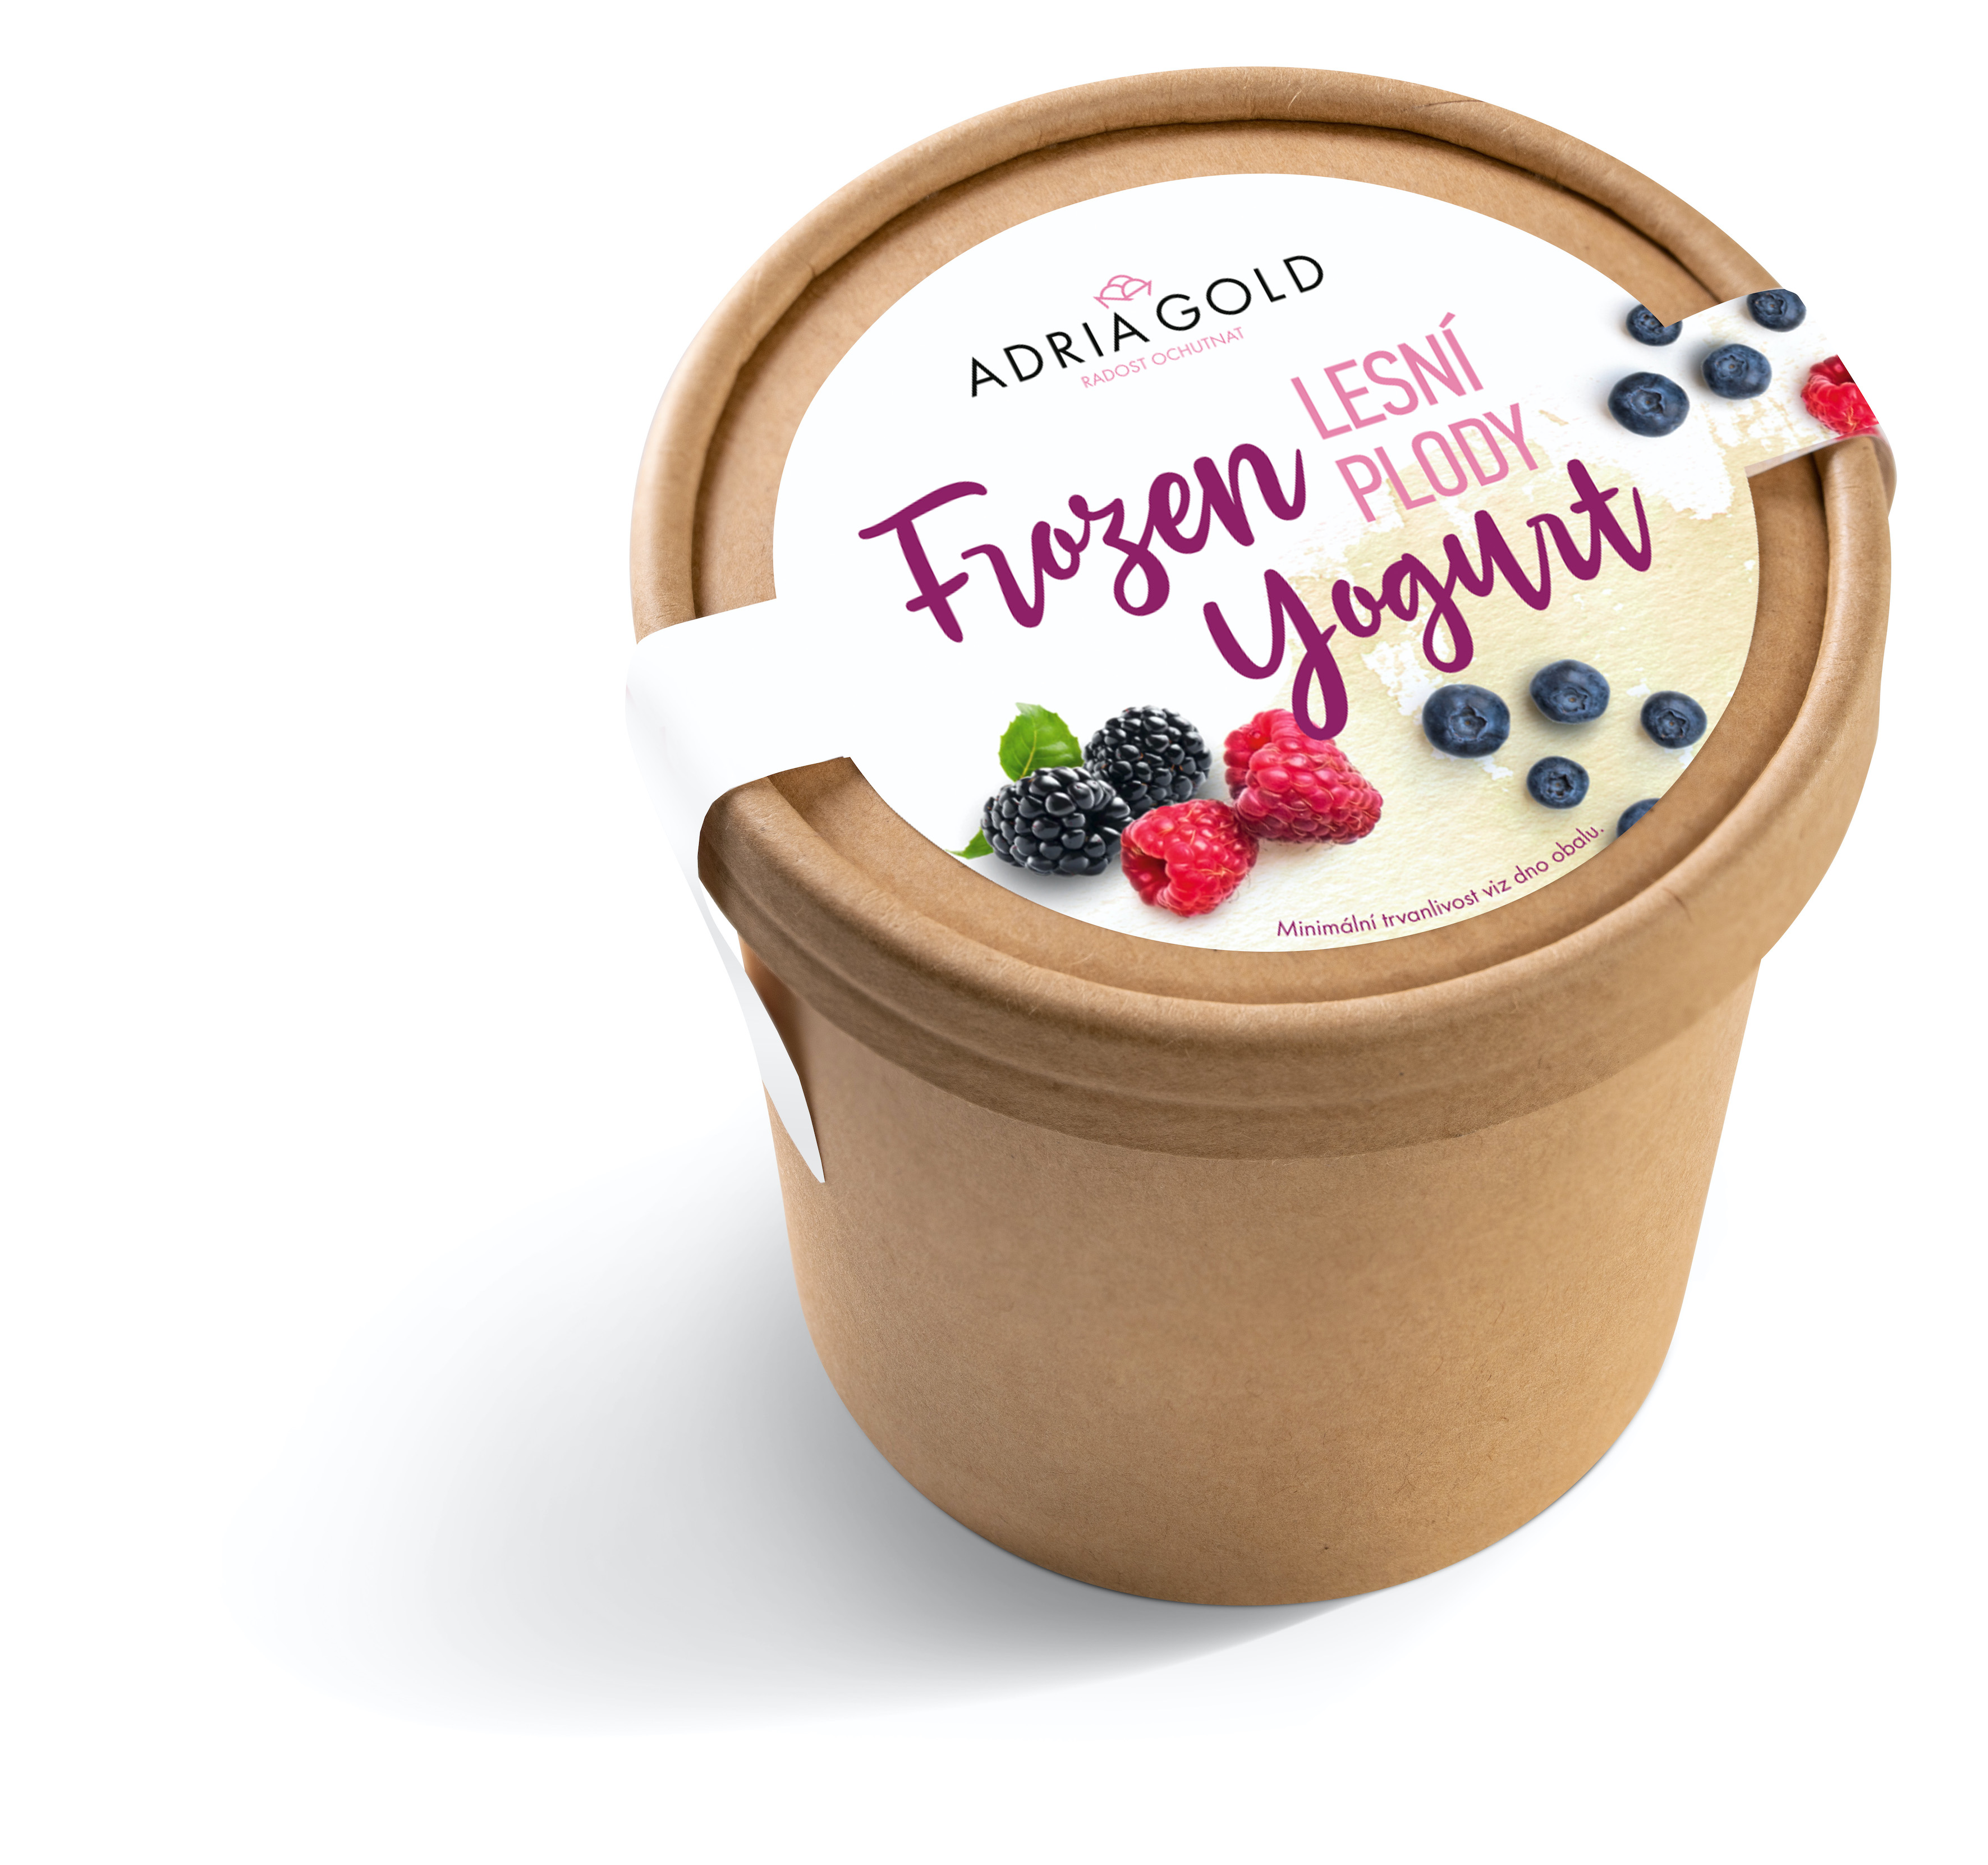 Frozen Yoghurt & Forest fruits